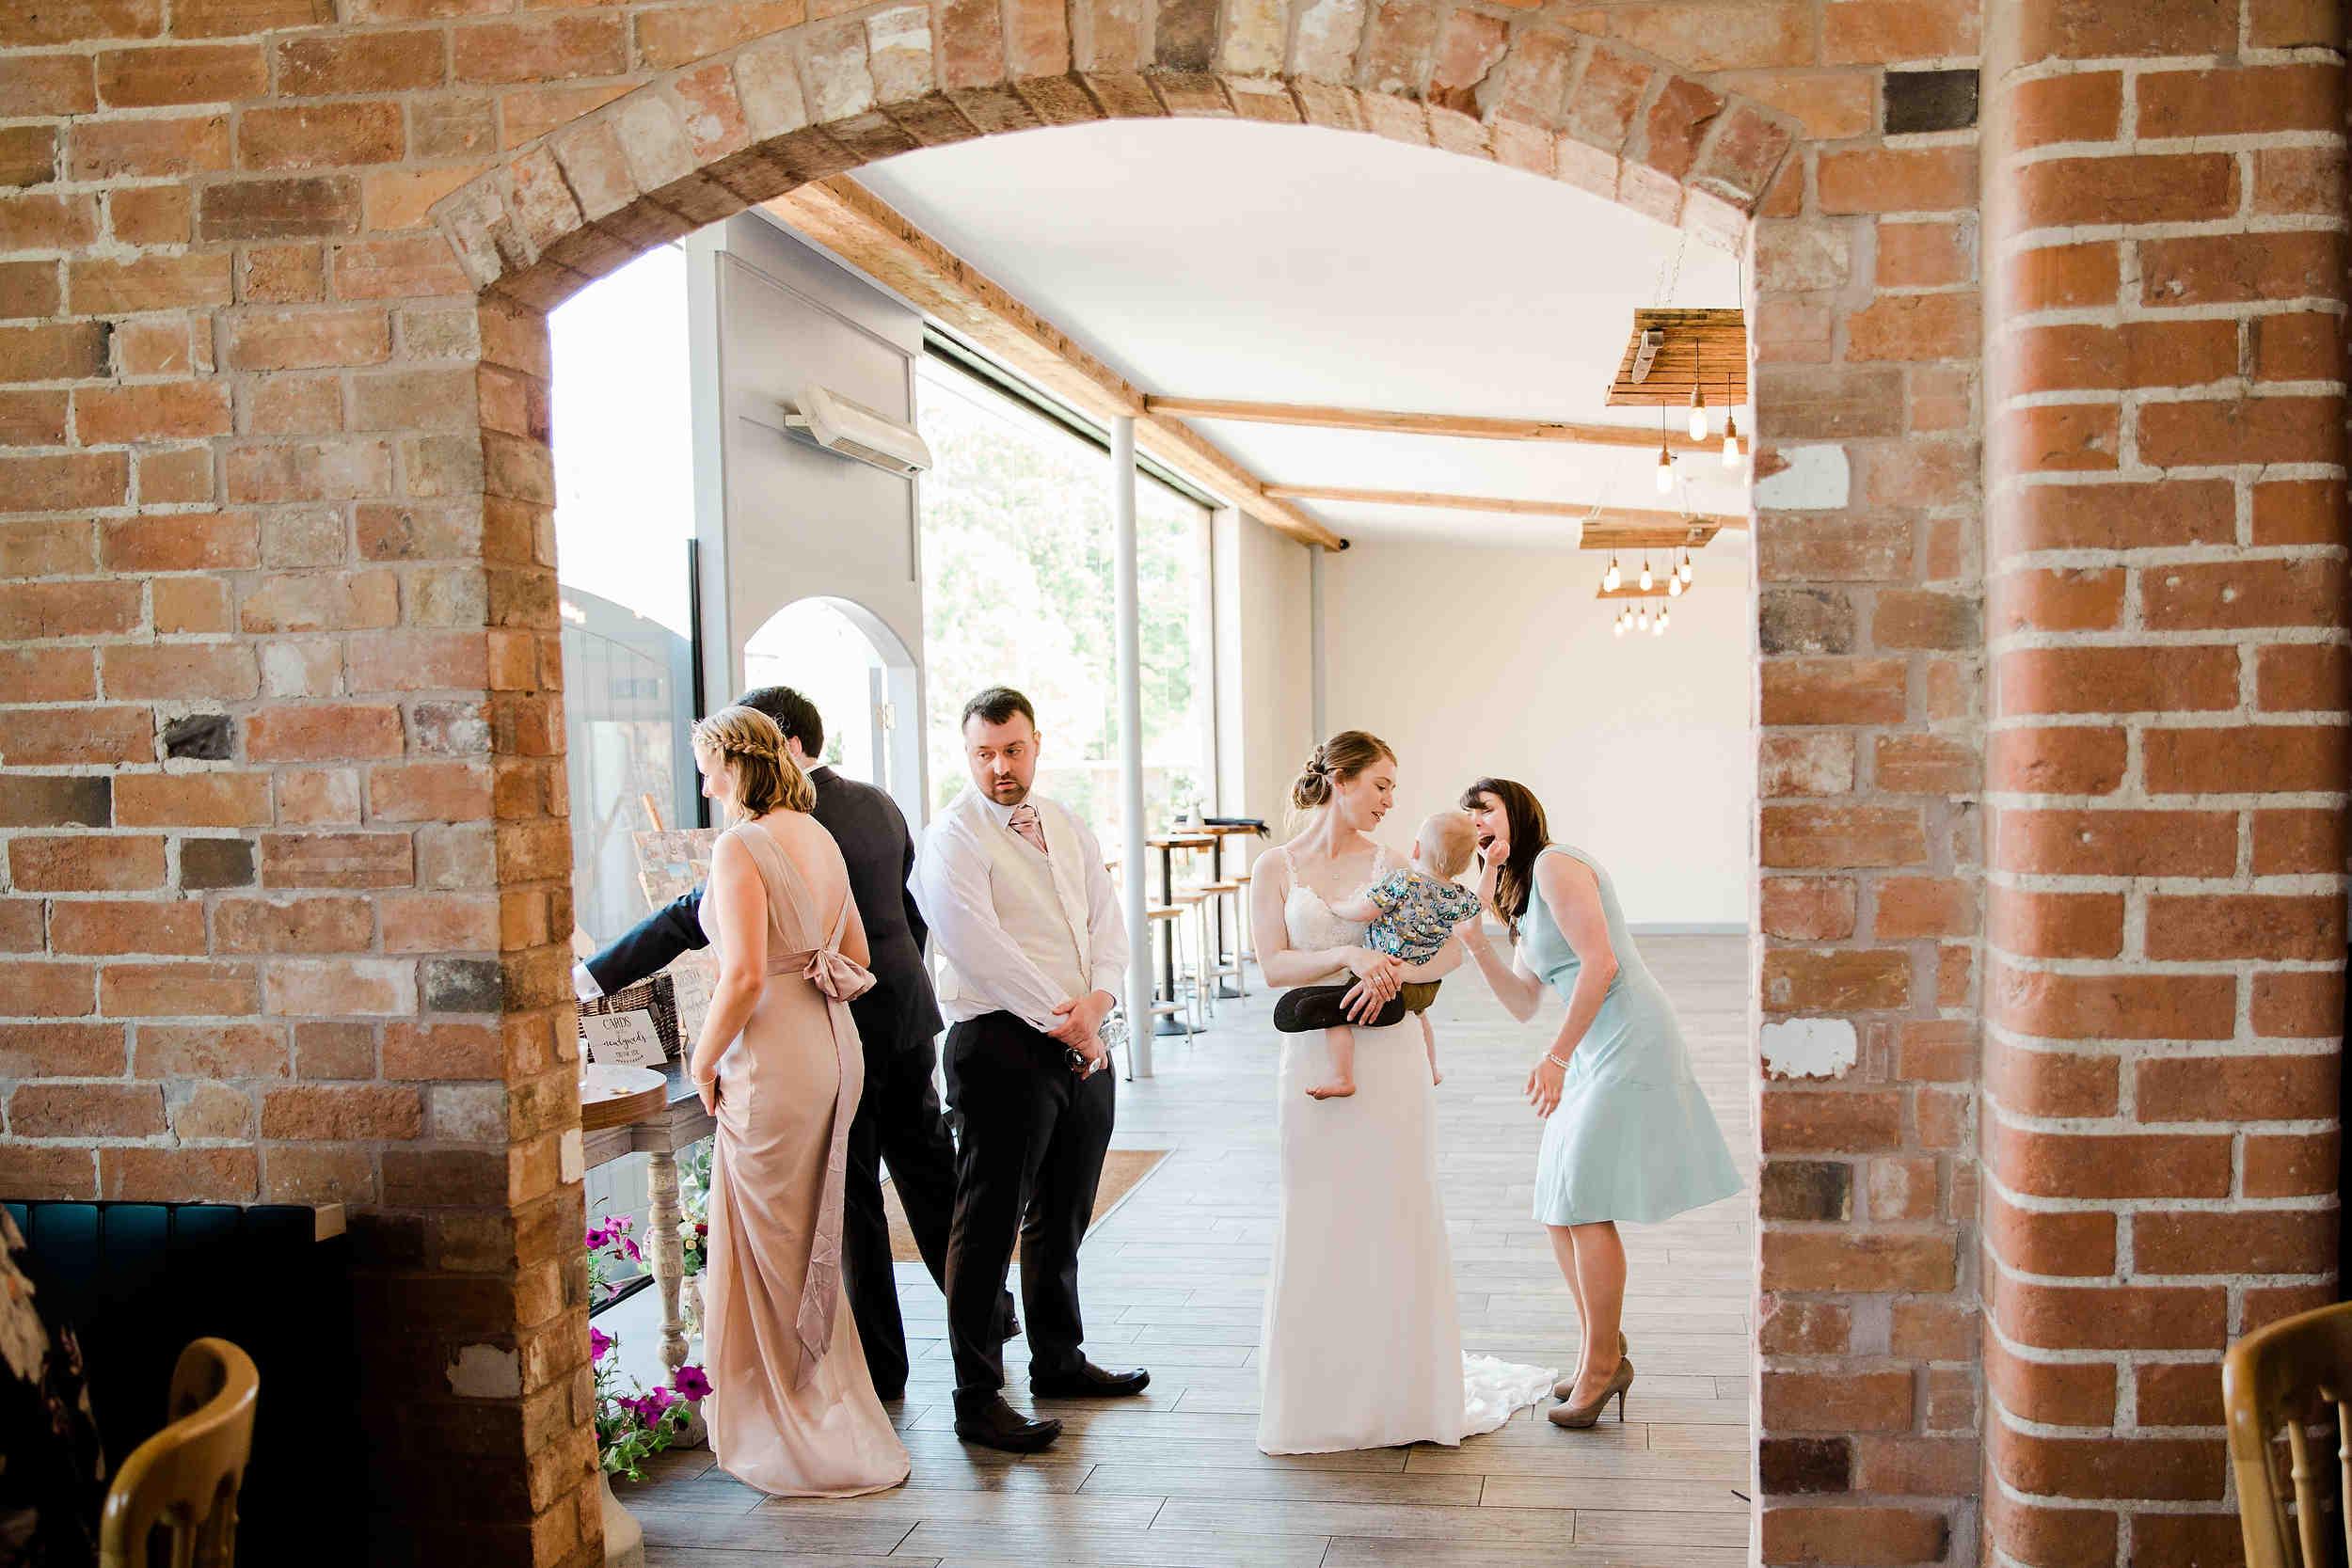 Modern_Stylish_Wedding_at_Swallows_Nest_Barn1241